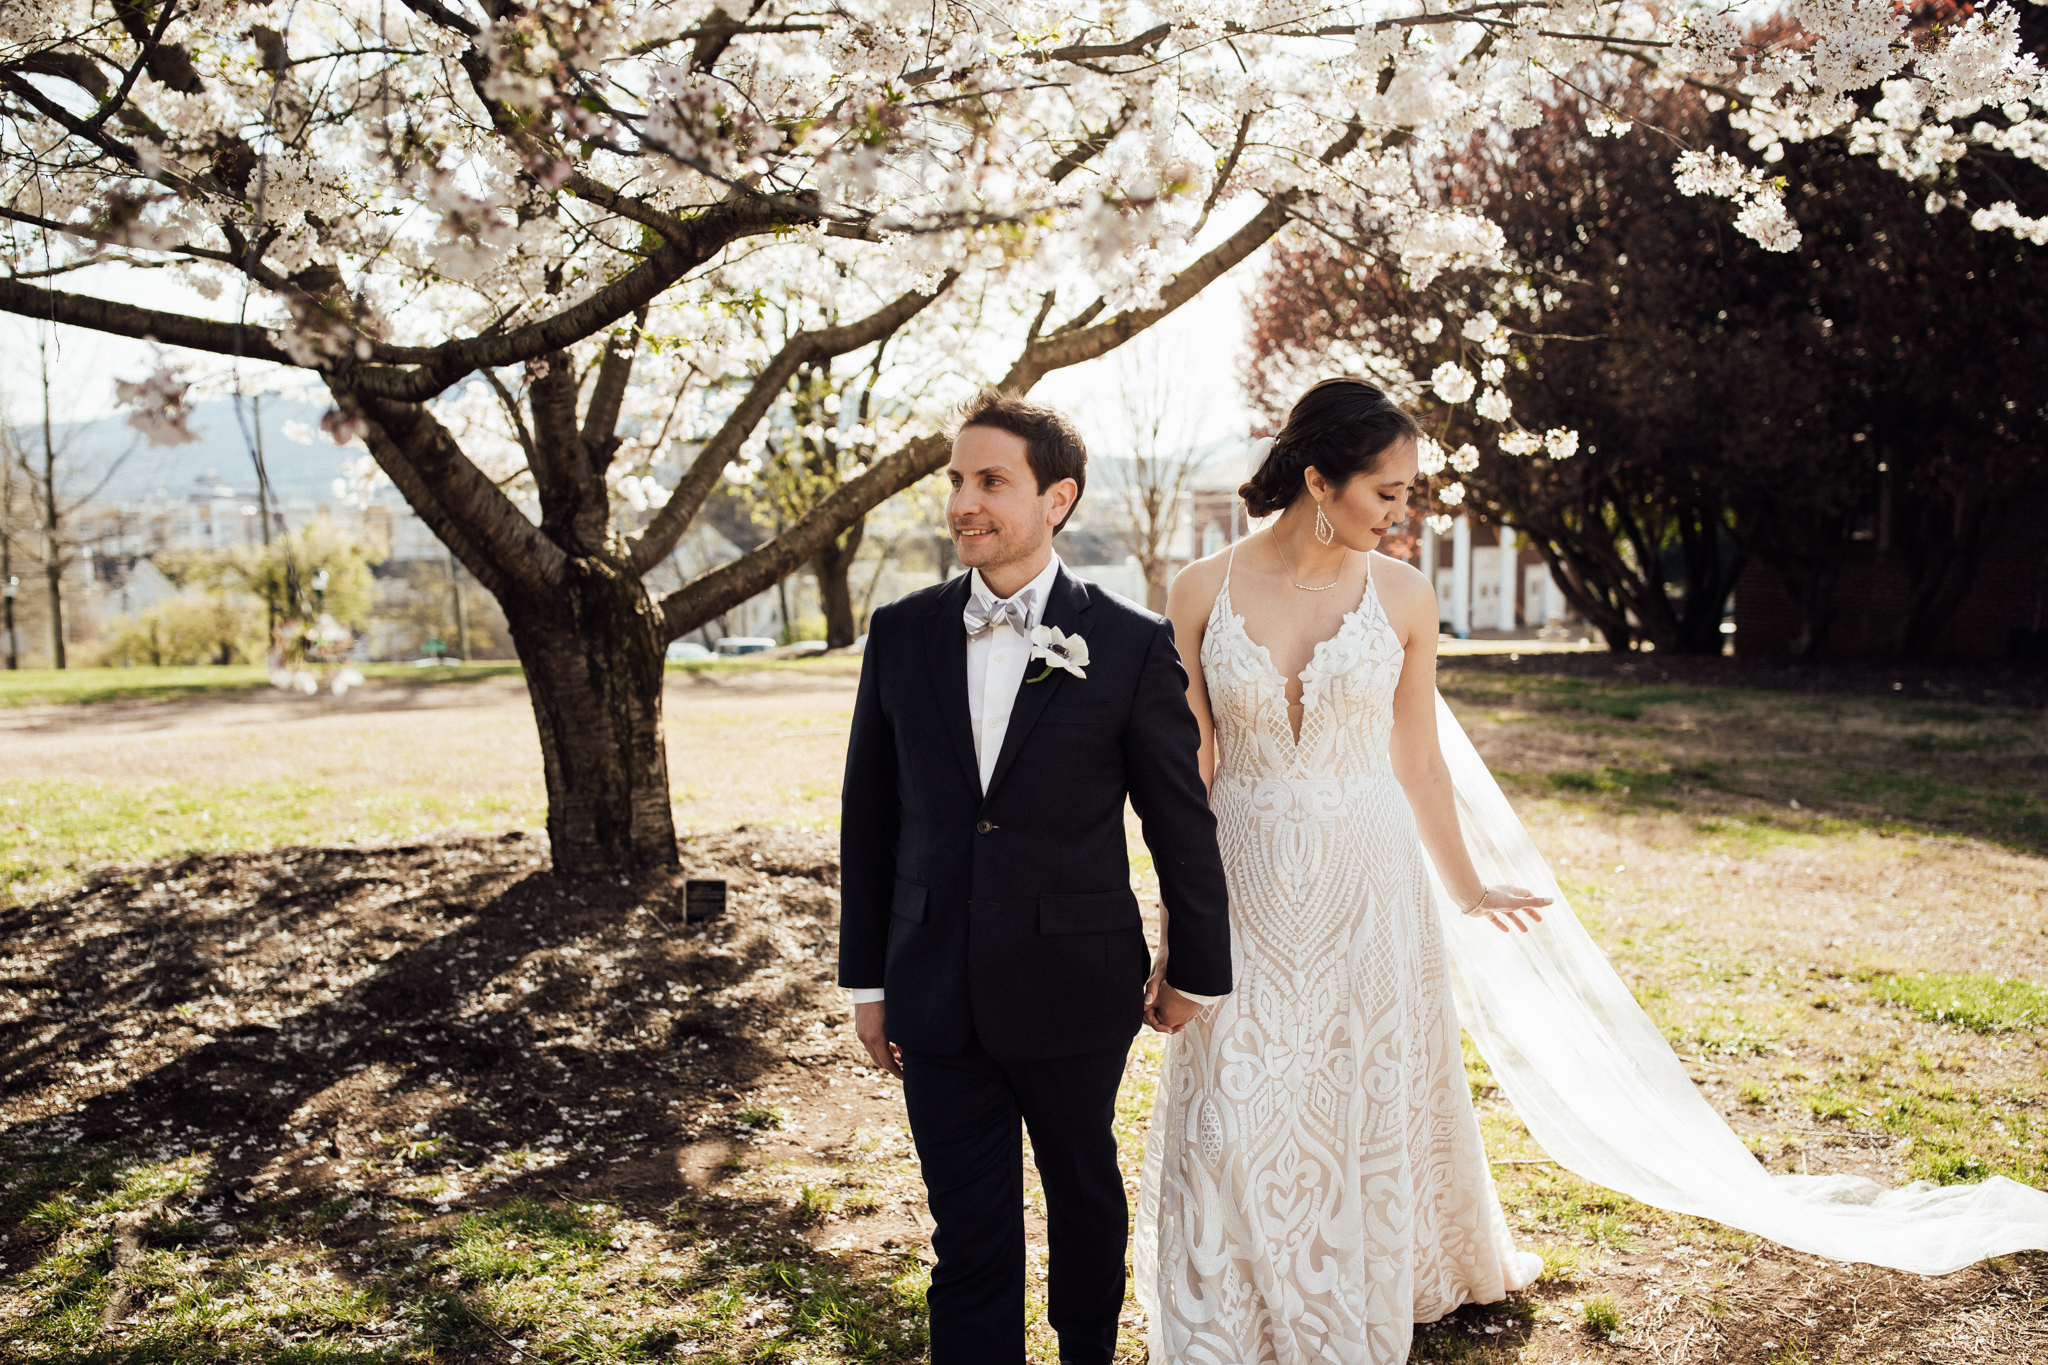 chattanooga-wedding-photographers-thewarmtharoundyou-waterhouse-pavilion-patten-chapel-wedding-sam-dusty (14 of 17).jpg